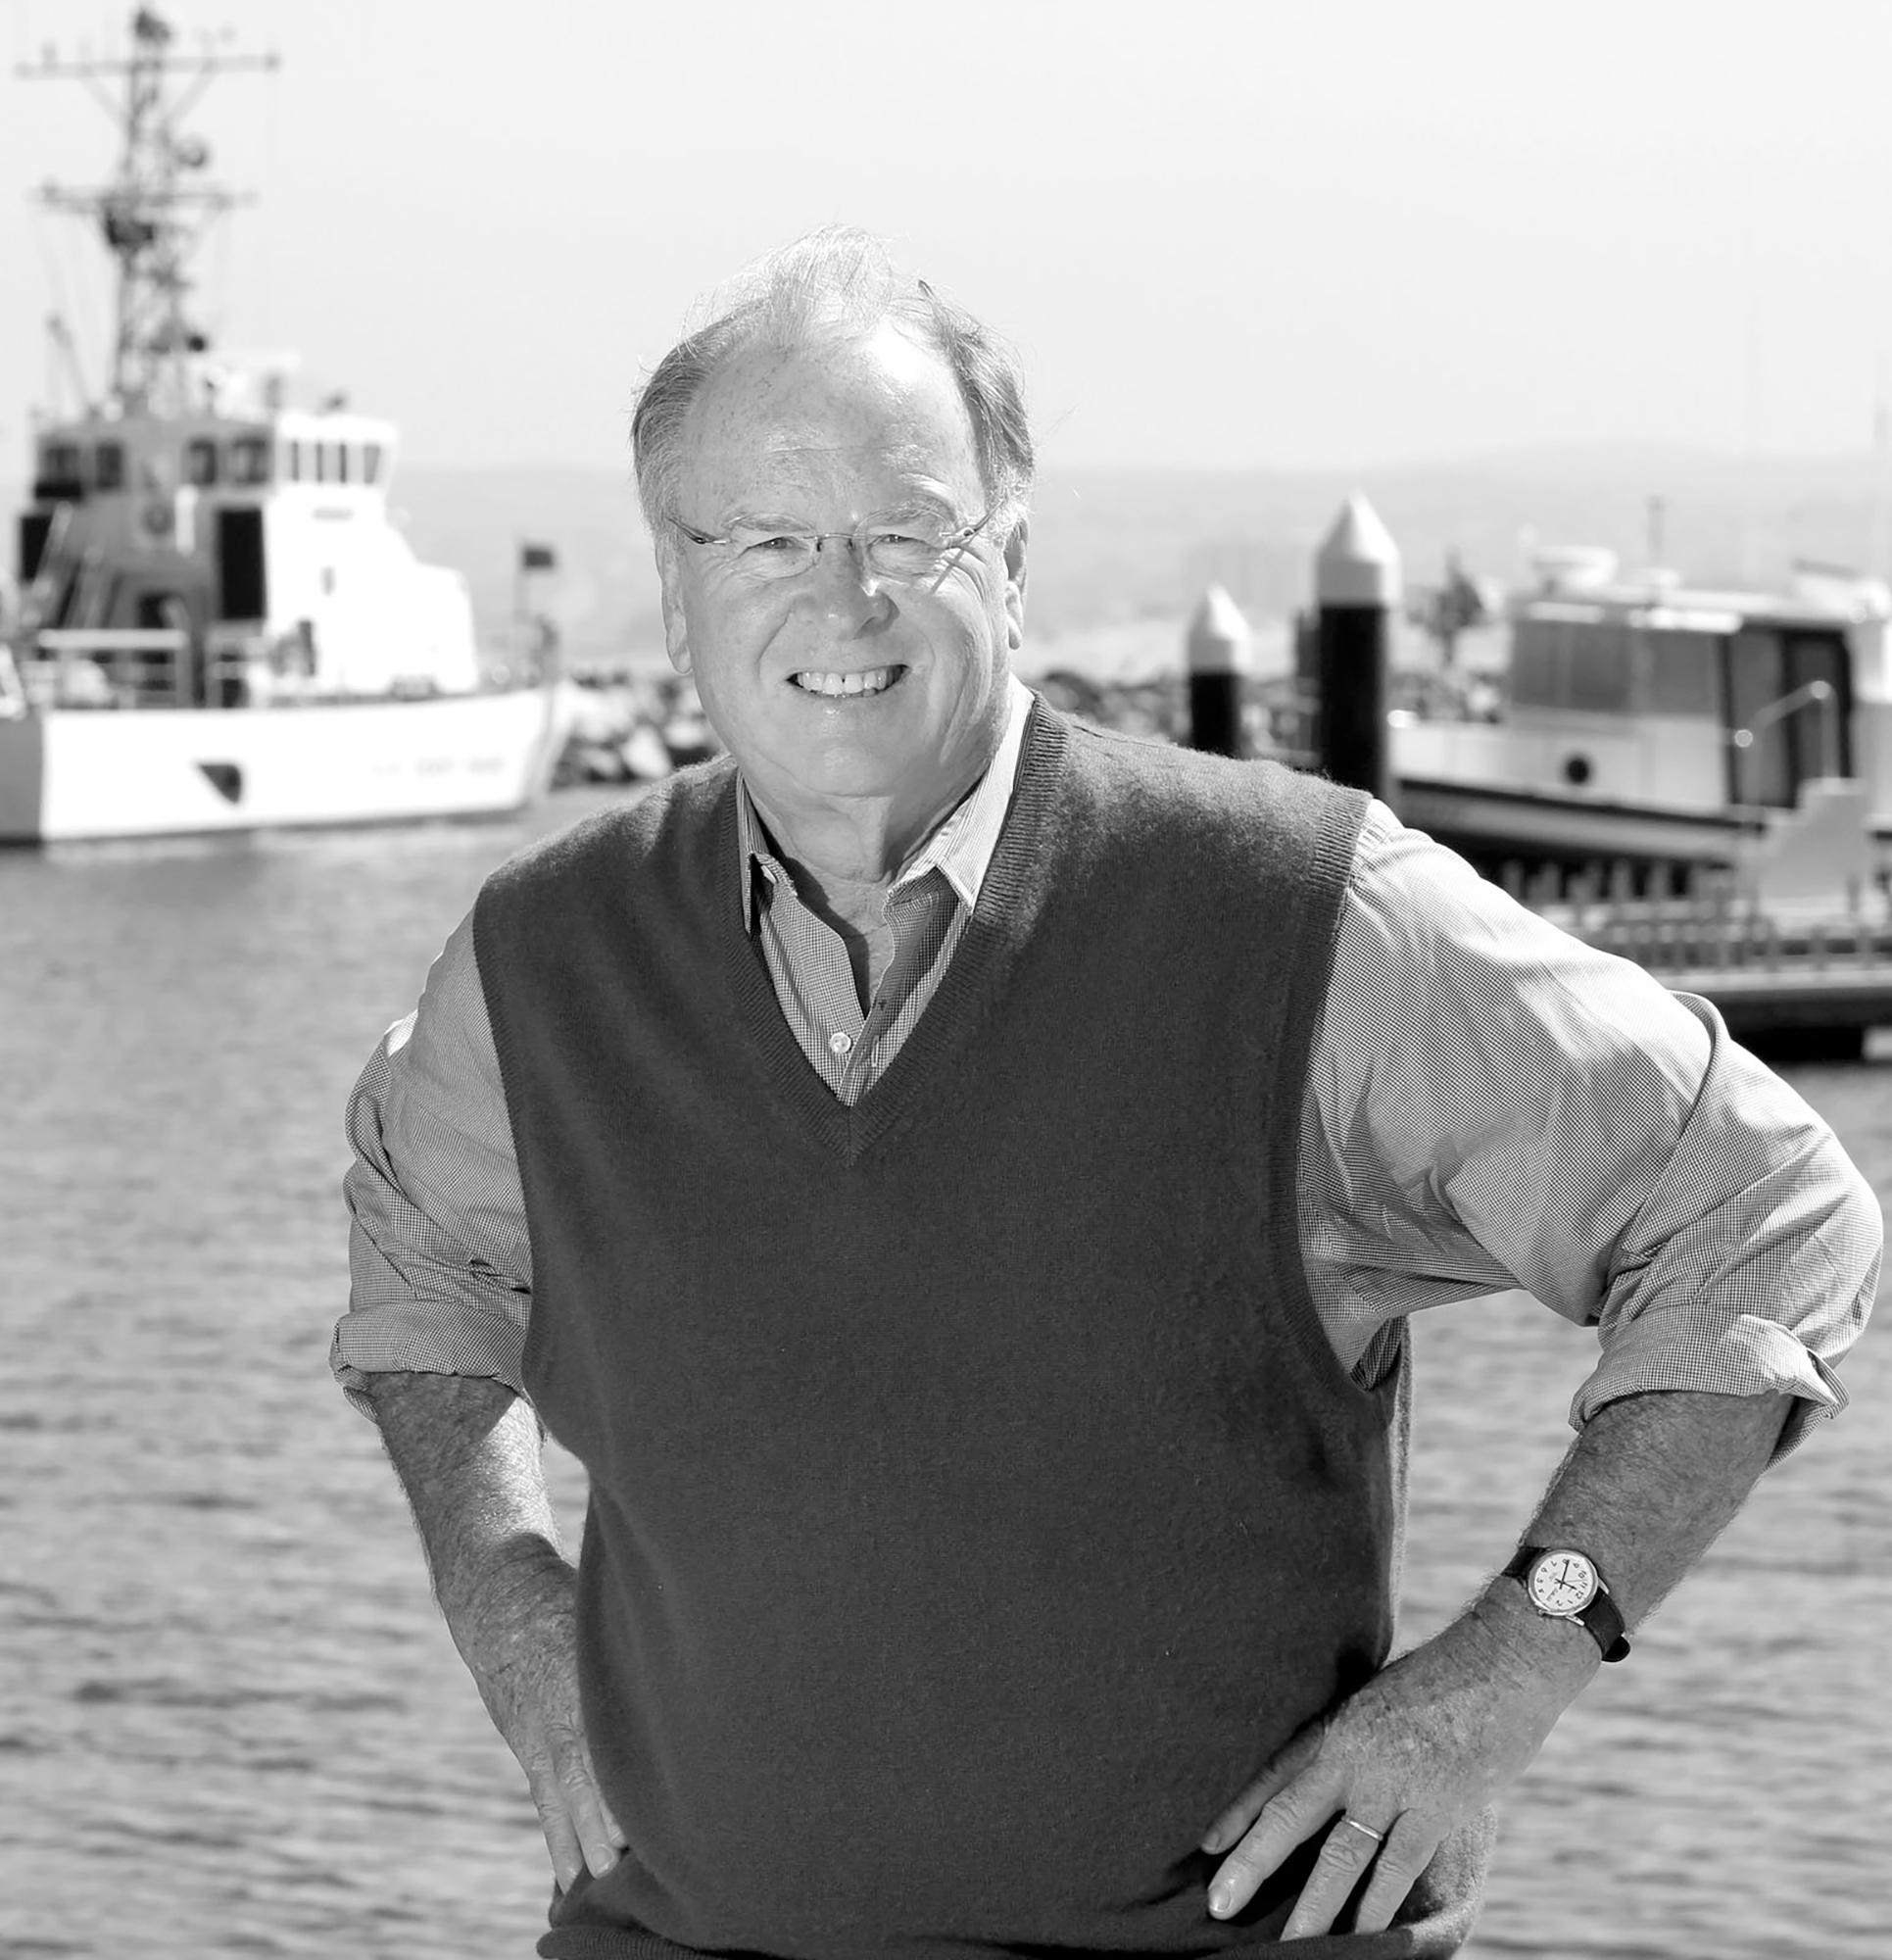 Former Rep. Sam Farr